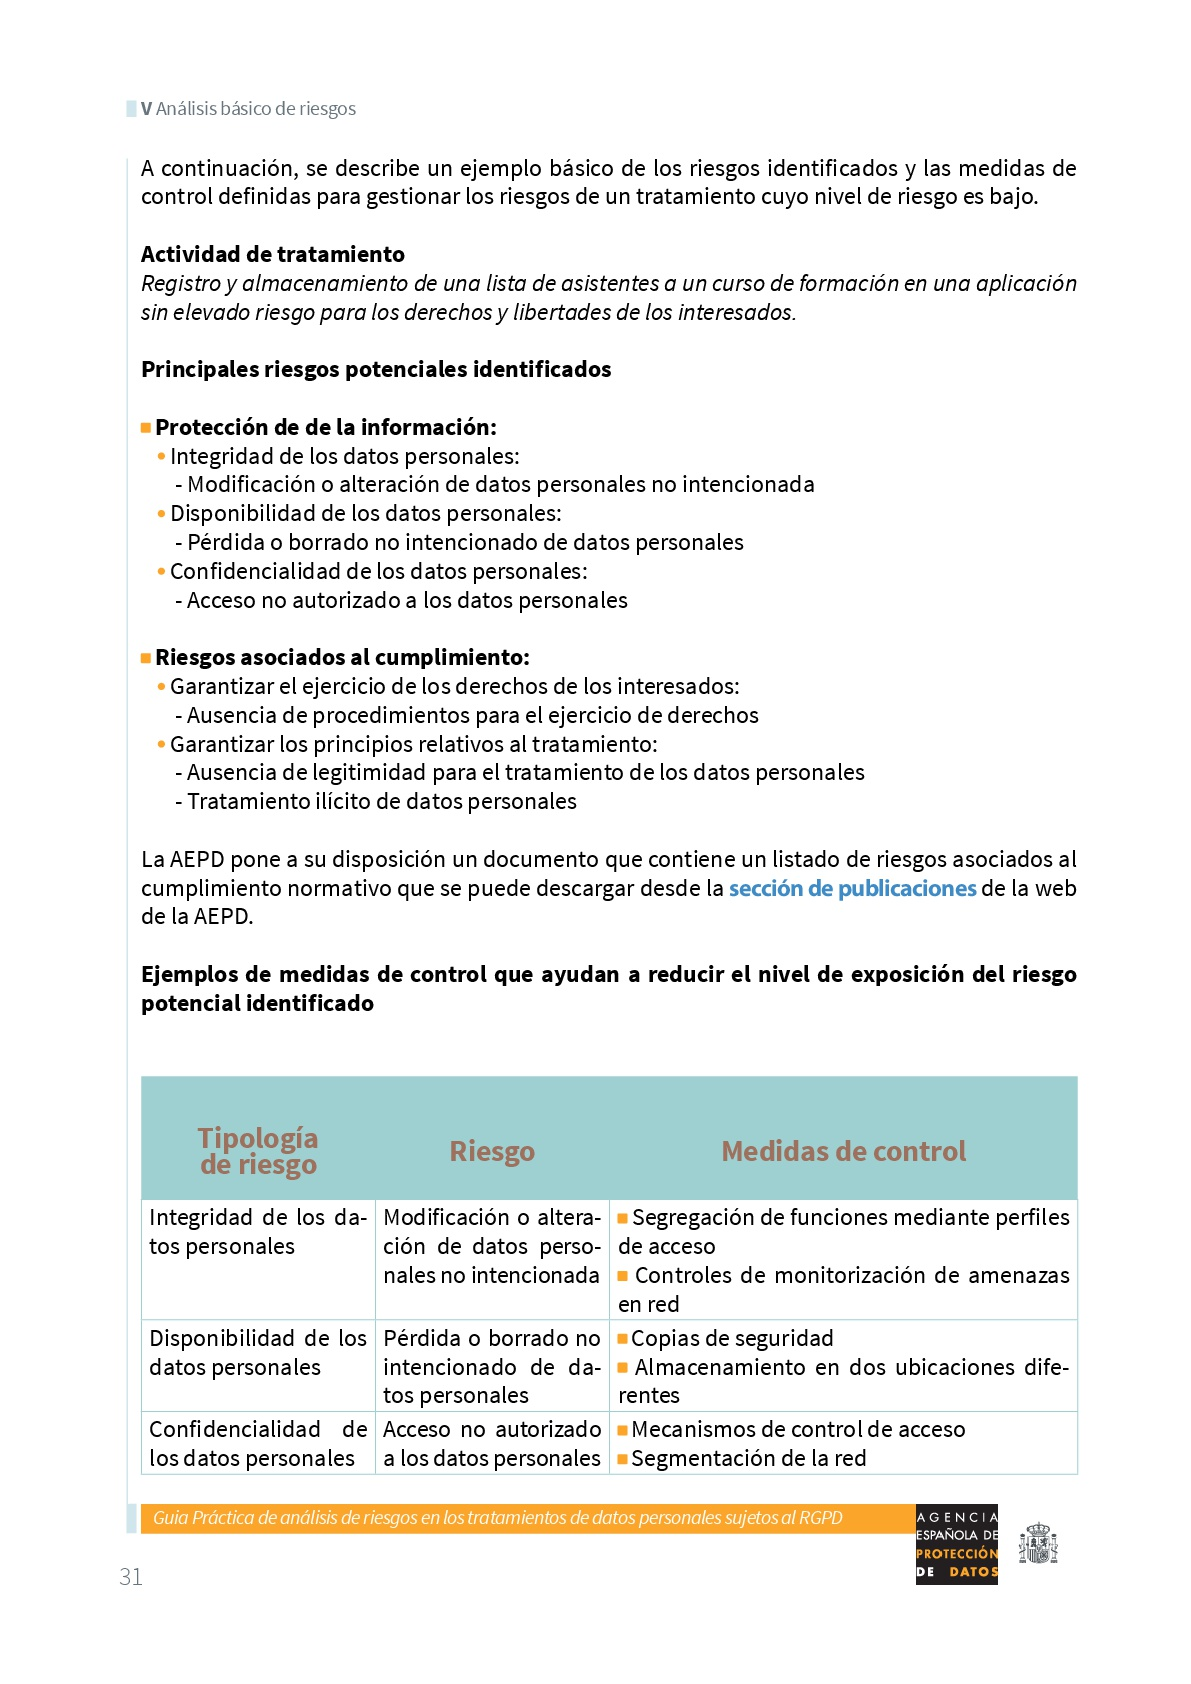 AnalisisDeRiesgosRGPD-032